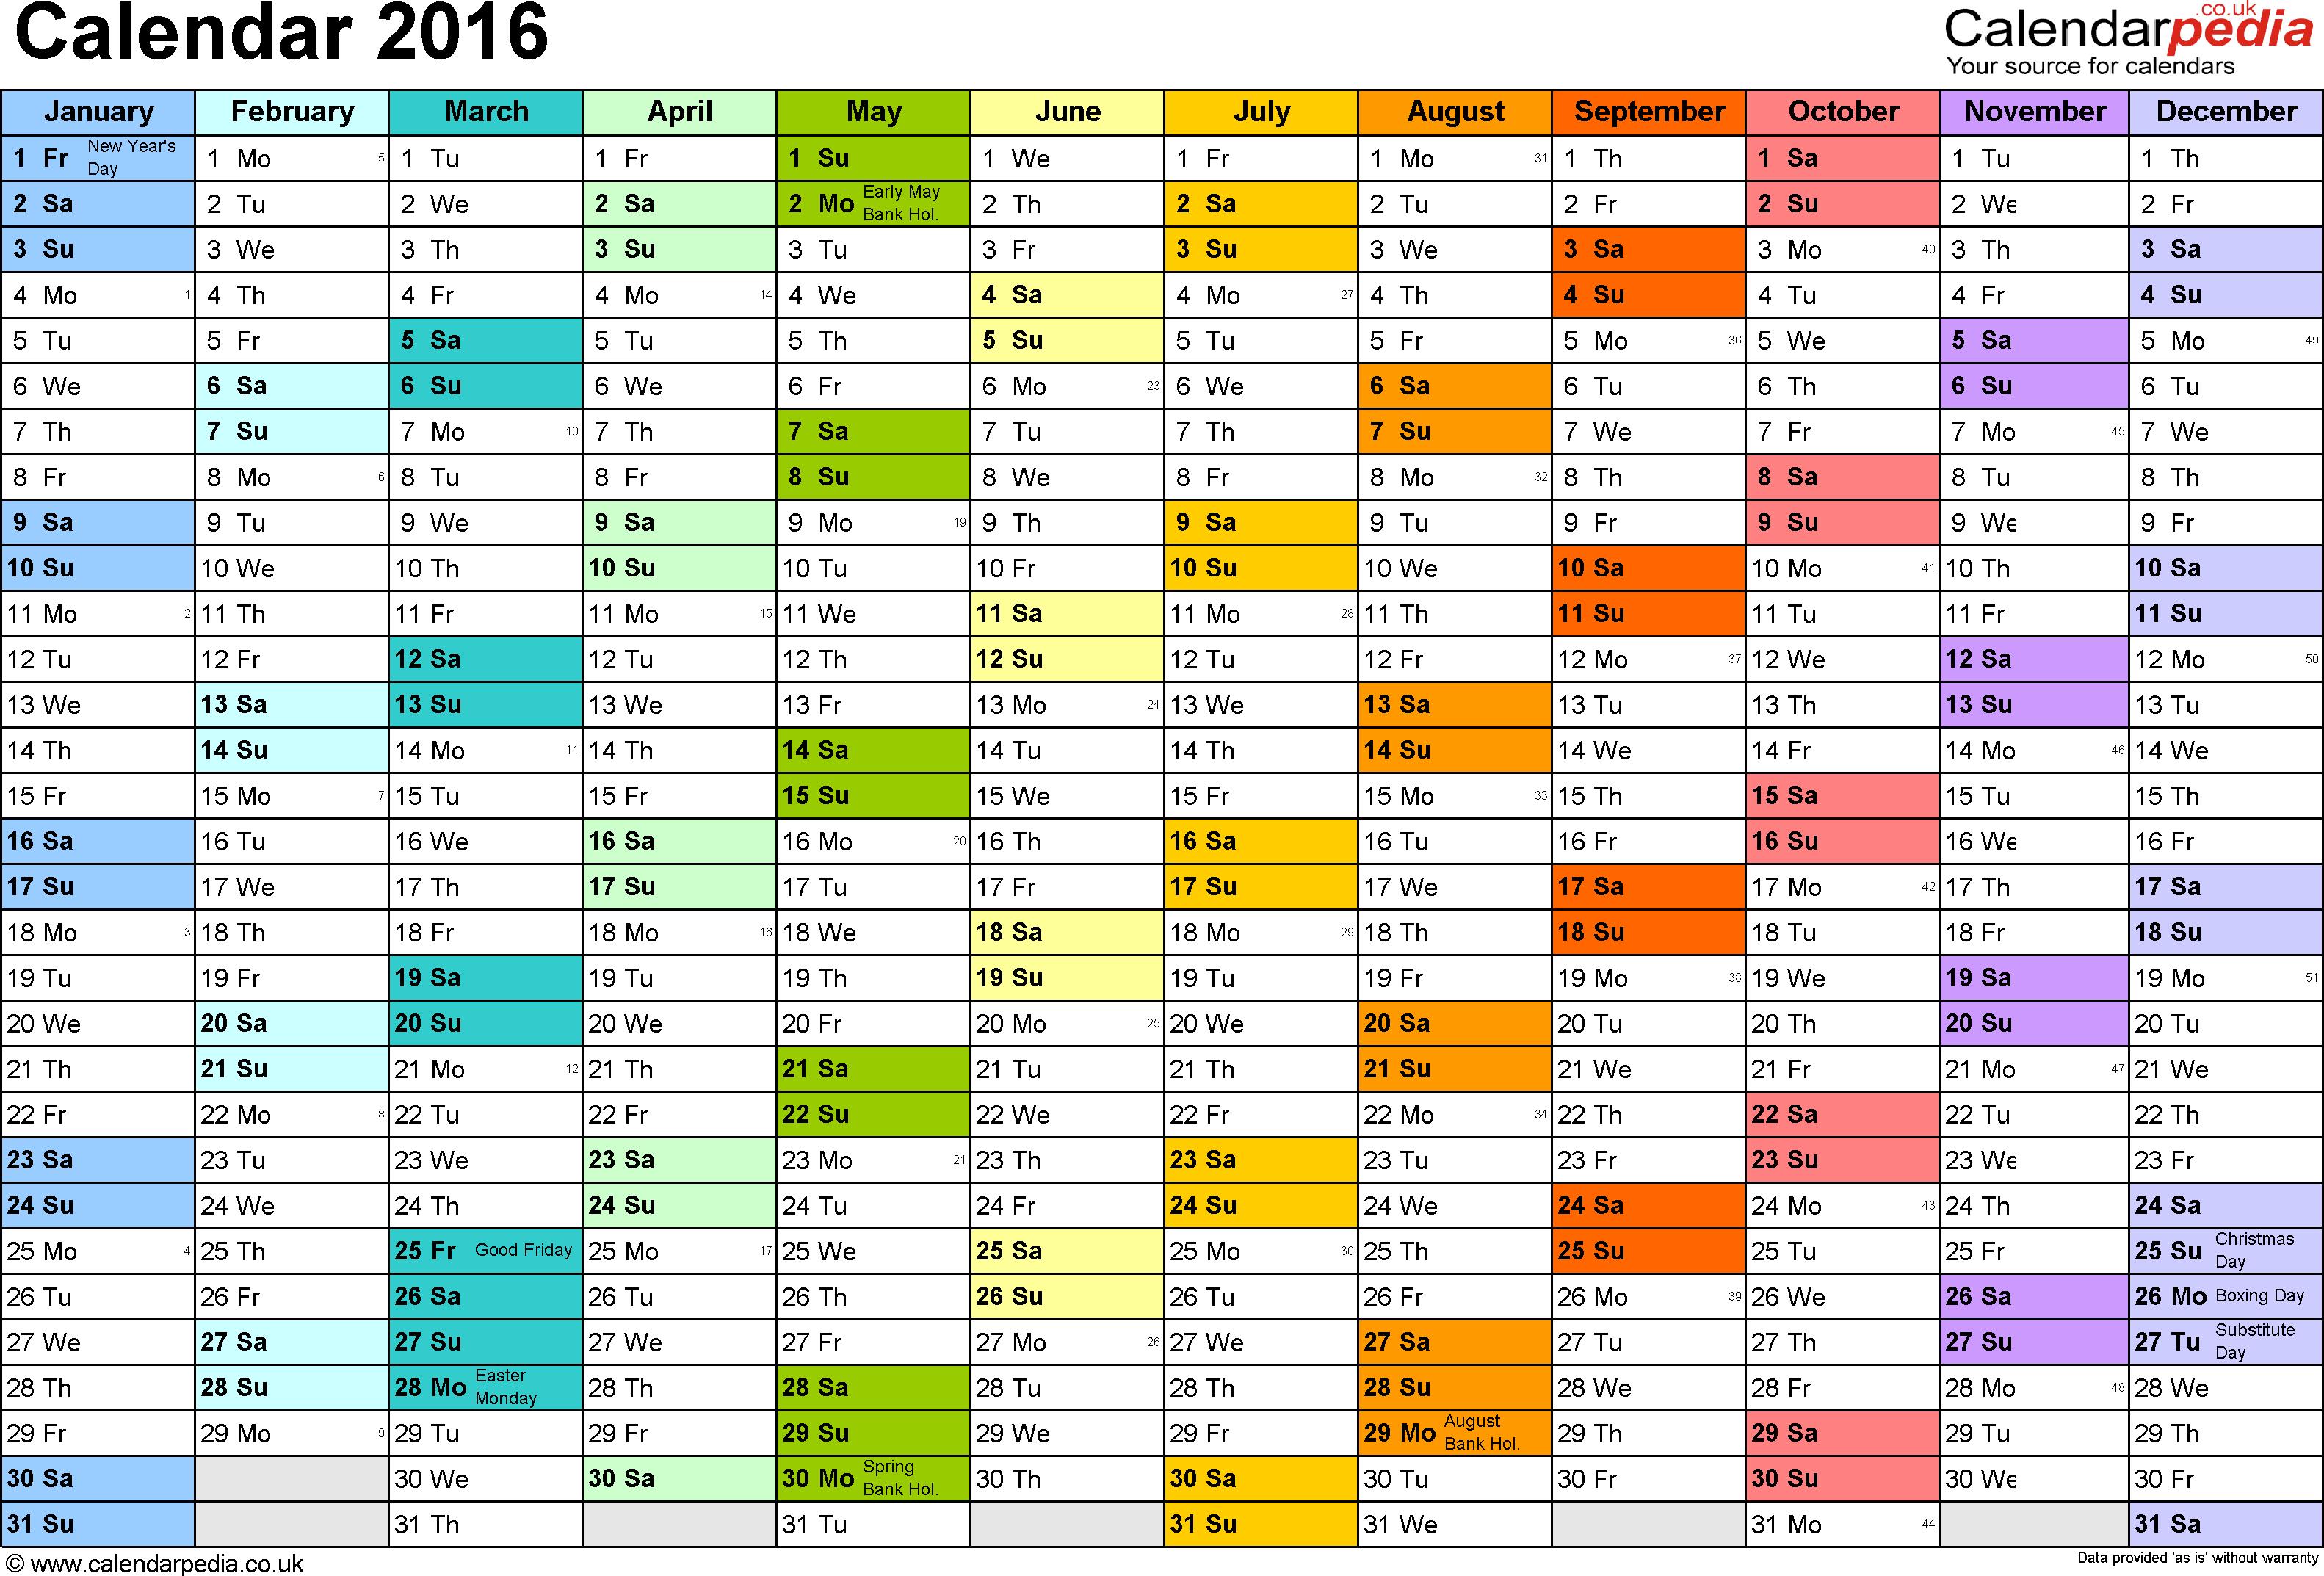 Calendar 2016 (Uk) - 16 Free Printable Word Templates - Free Printable Monthly Planner 2016